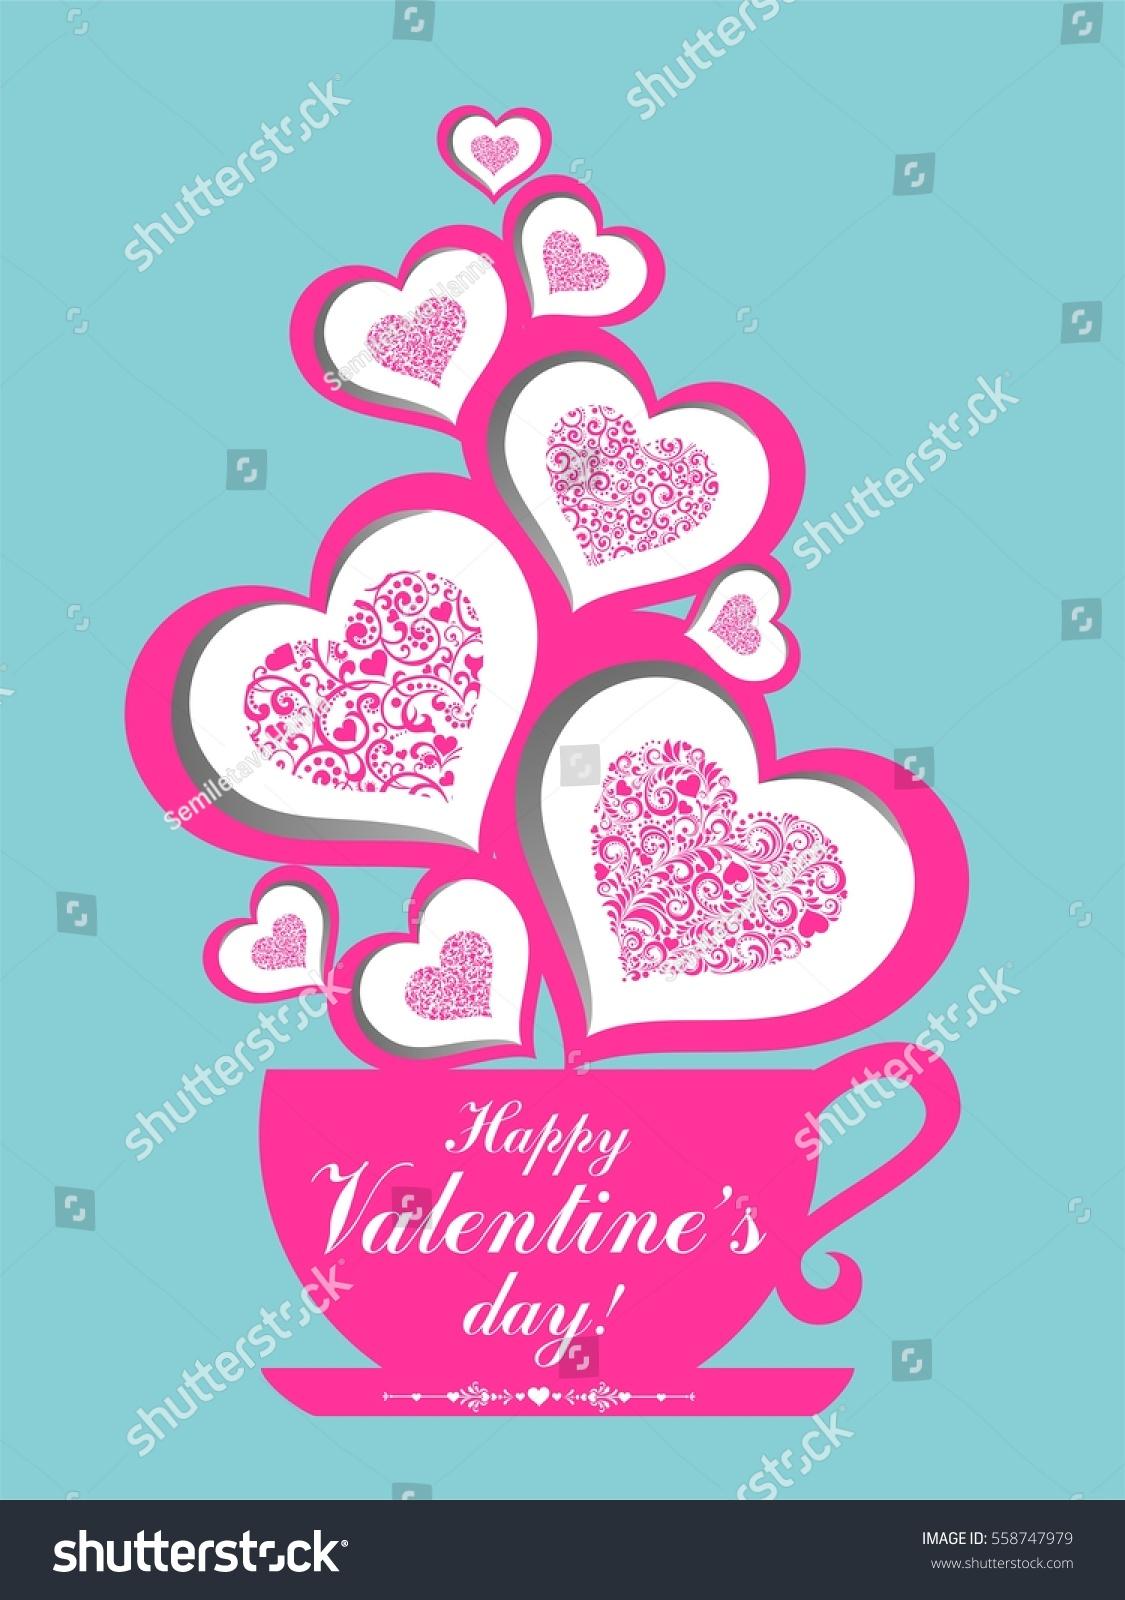 Happy valentines day greeting card restaurant stock vector 558747979 happy valentines day greeting card restaurant menu card design menu template on valentines kristyandbryce Choice Image